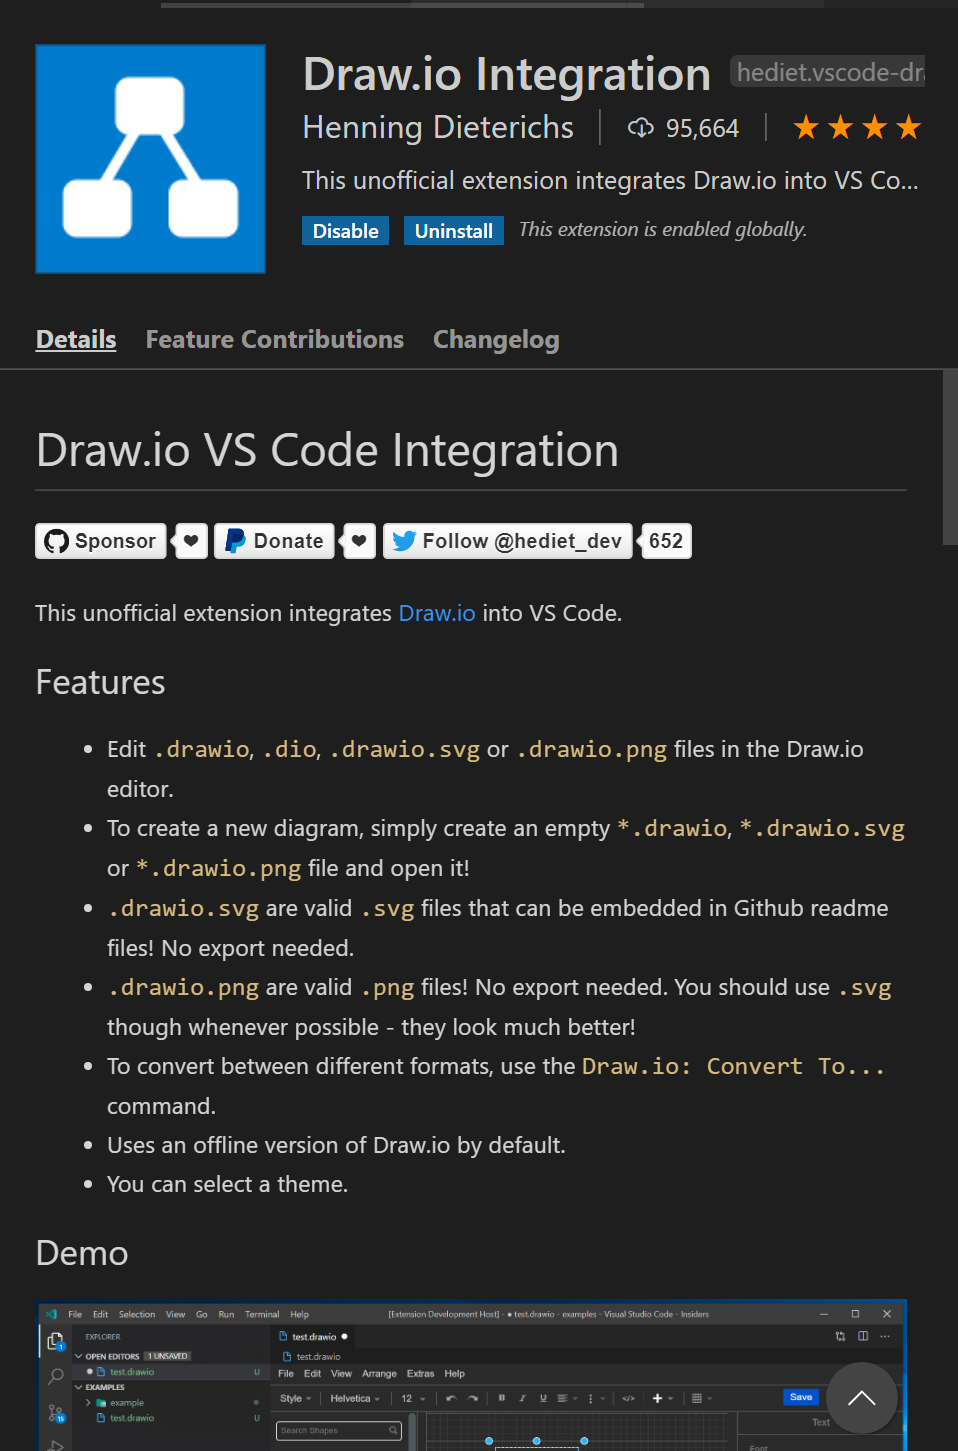 Draw.io Integration